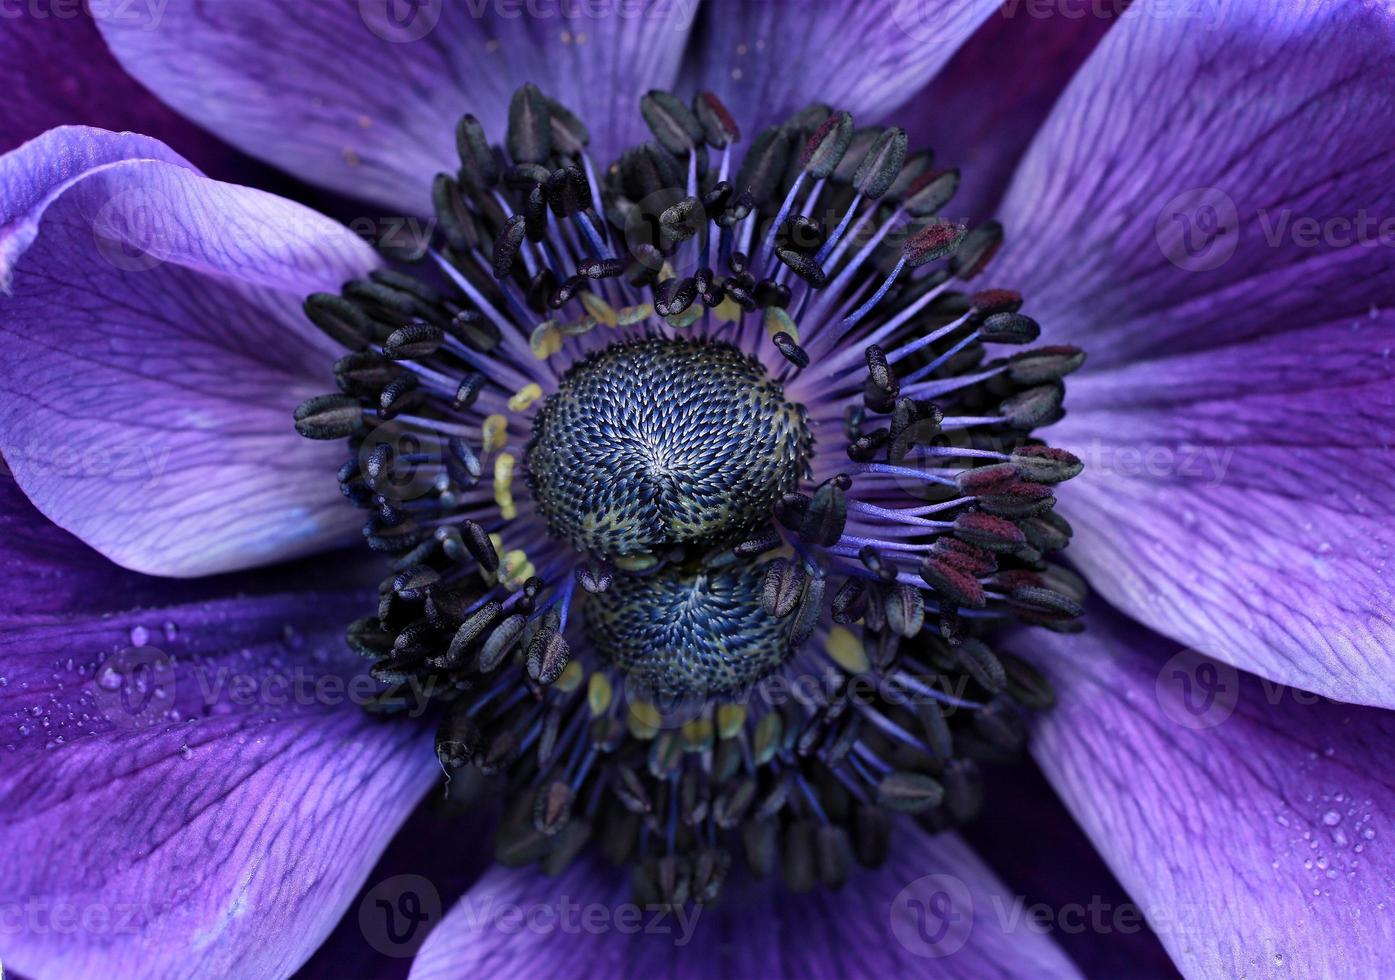 Anemone close up photo